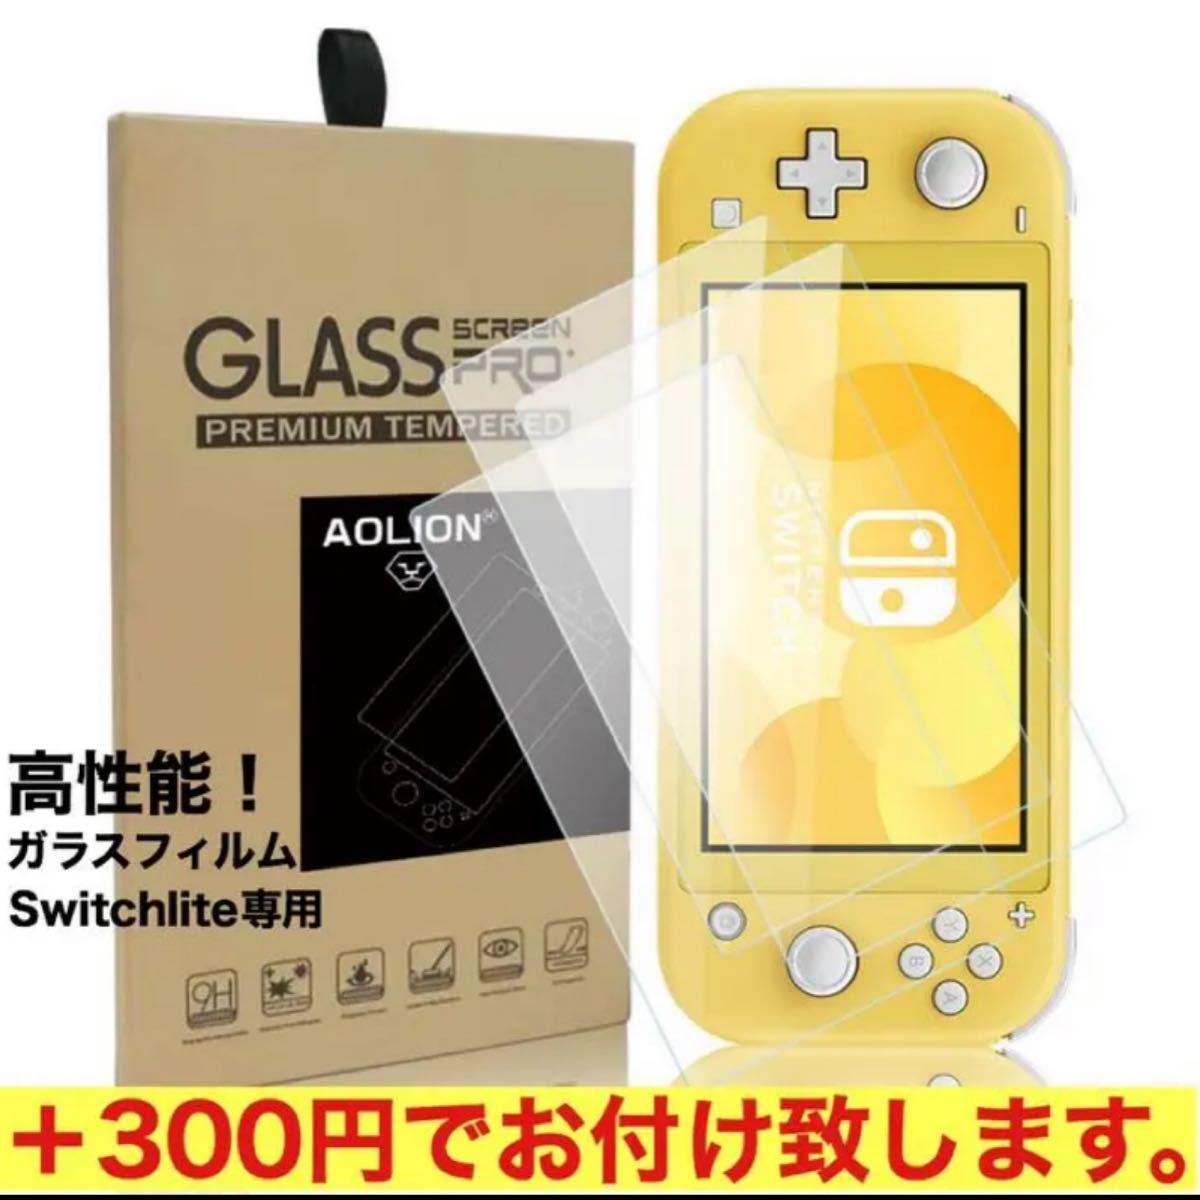 Nintendo 任天堂 Switch lite スイッチライト シリコン ケース カバー ソフトケース保護 ブラック